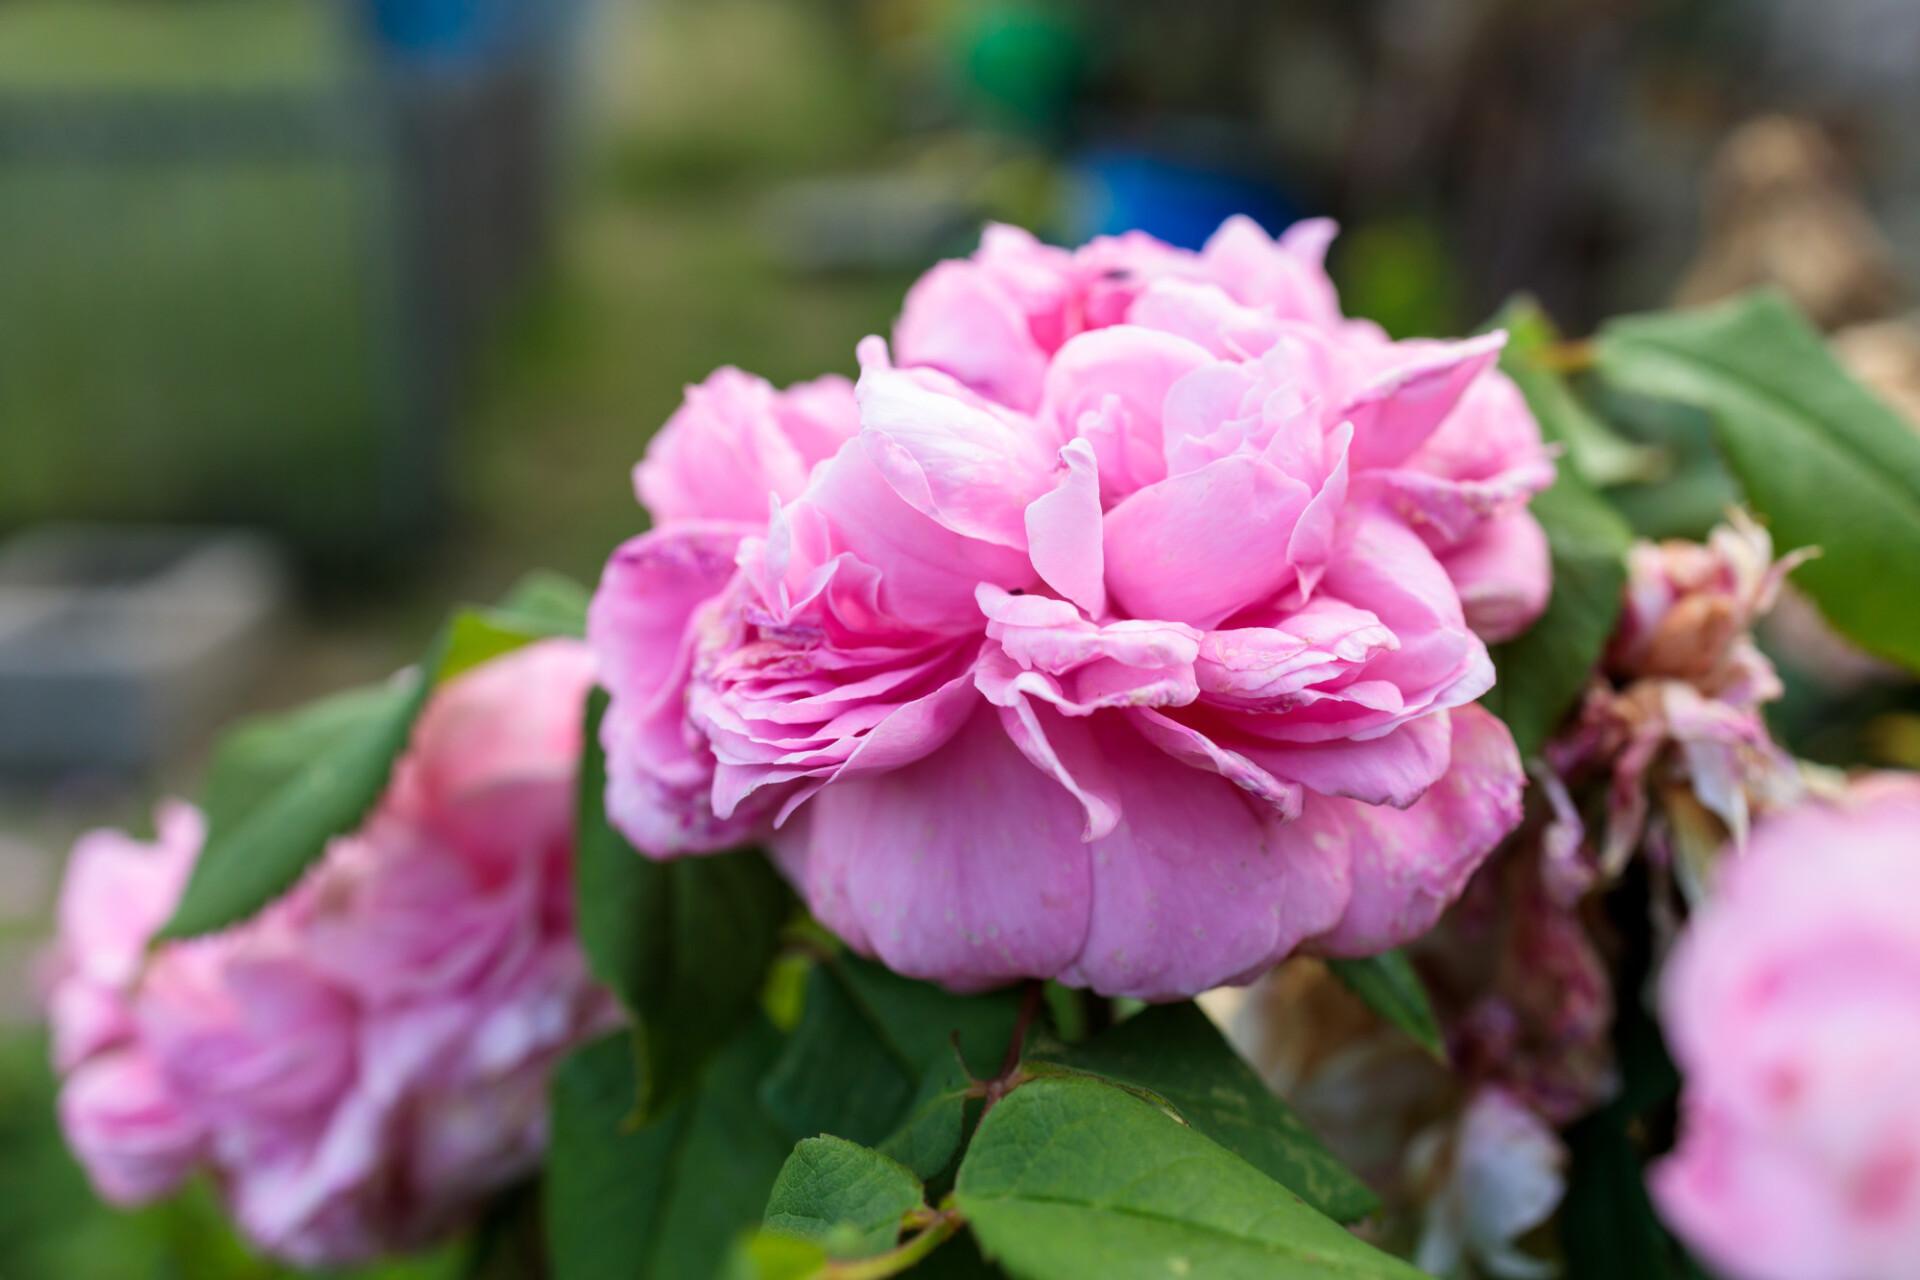 Pink Rose blooms in summer